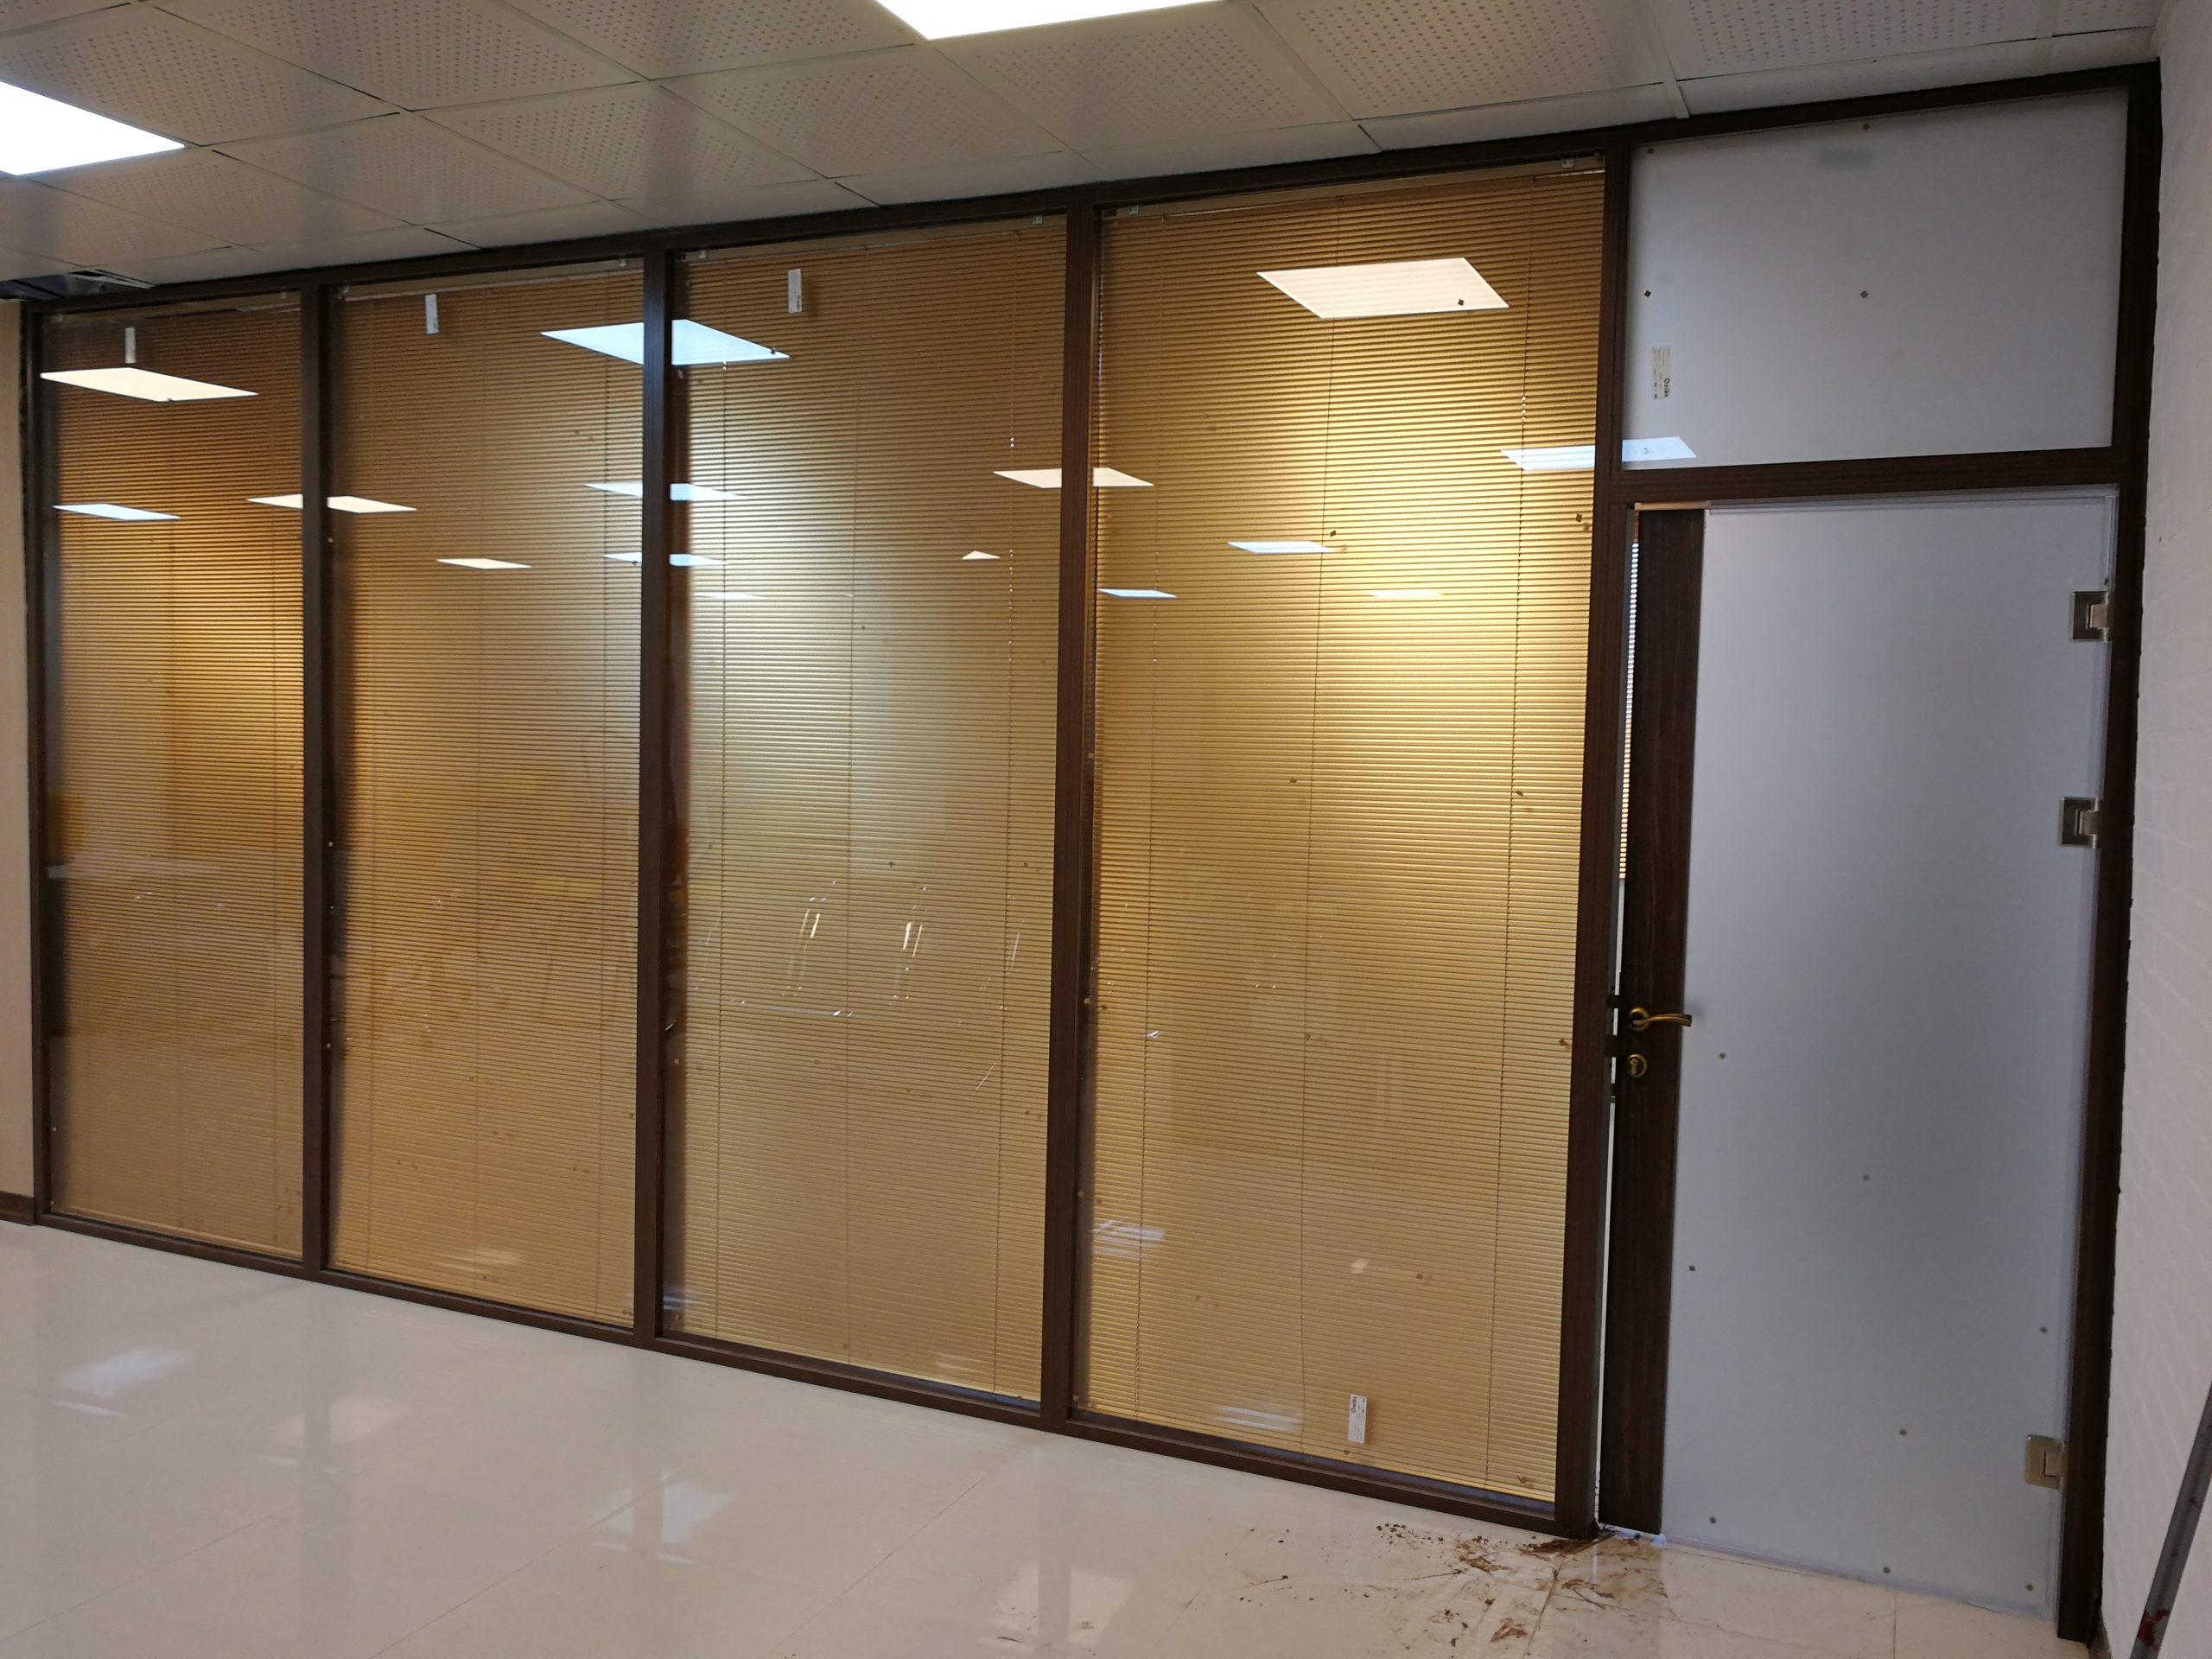 ام دی اف تمام شیشه K200 3 scaled - پارتیشن ام دی اف اداری